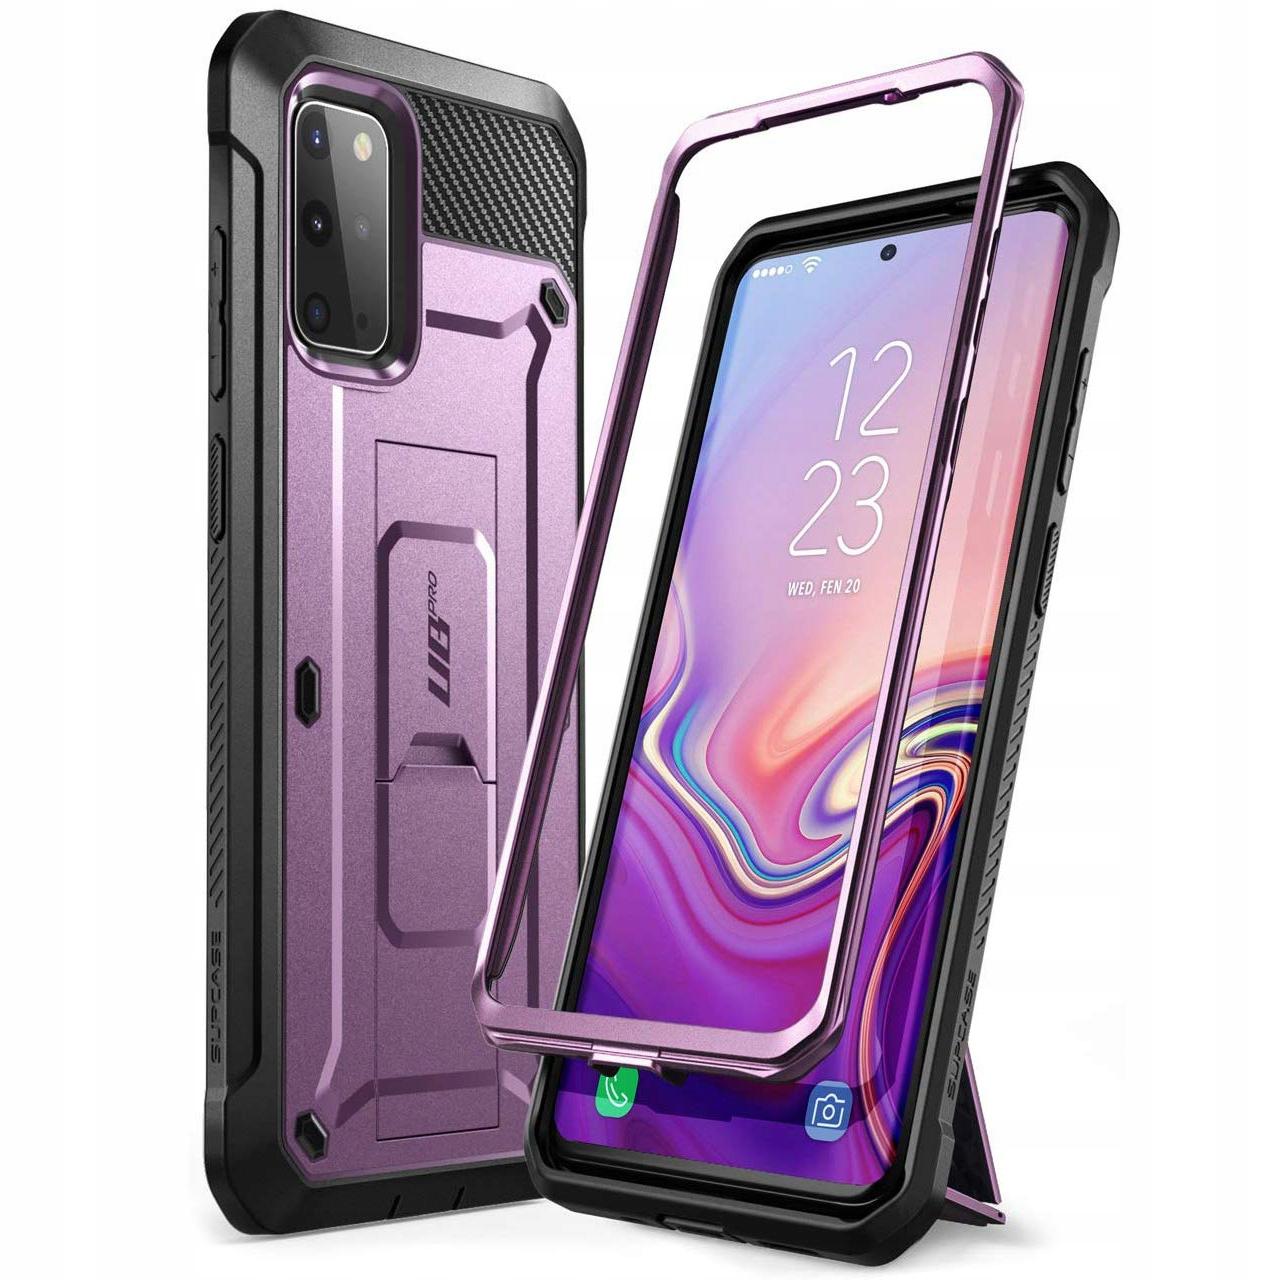 Etui Supcase do Galaxy S20 Plus, cover, Ub Pro